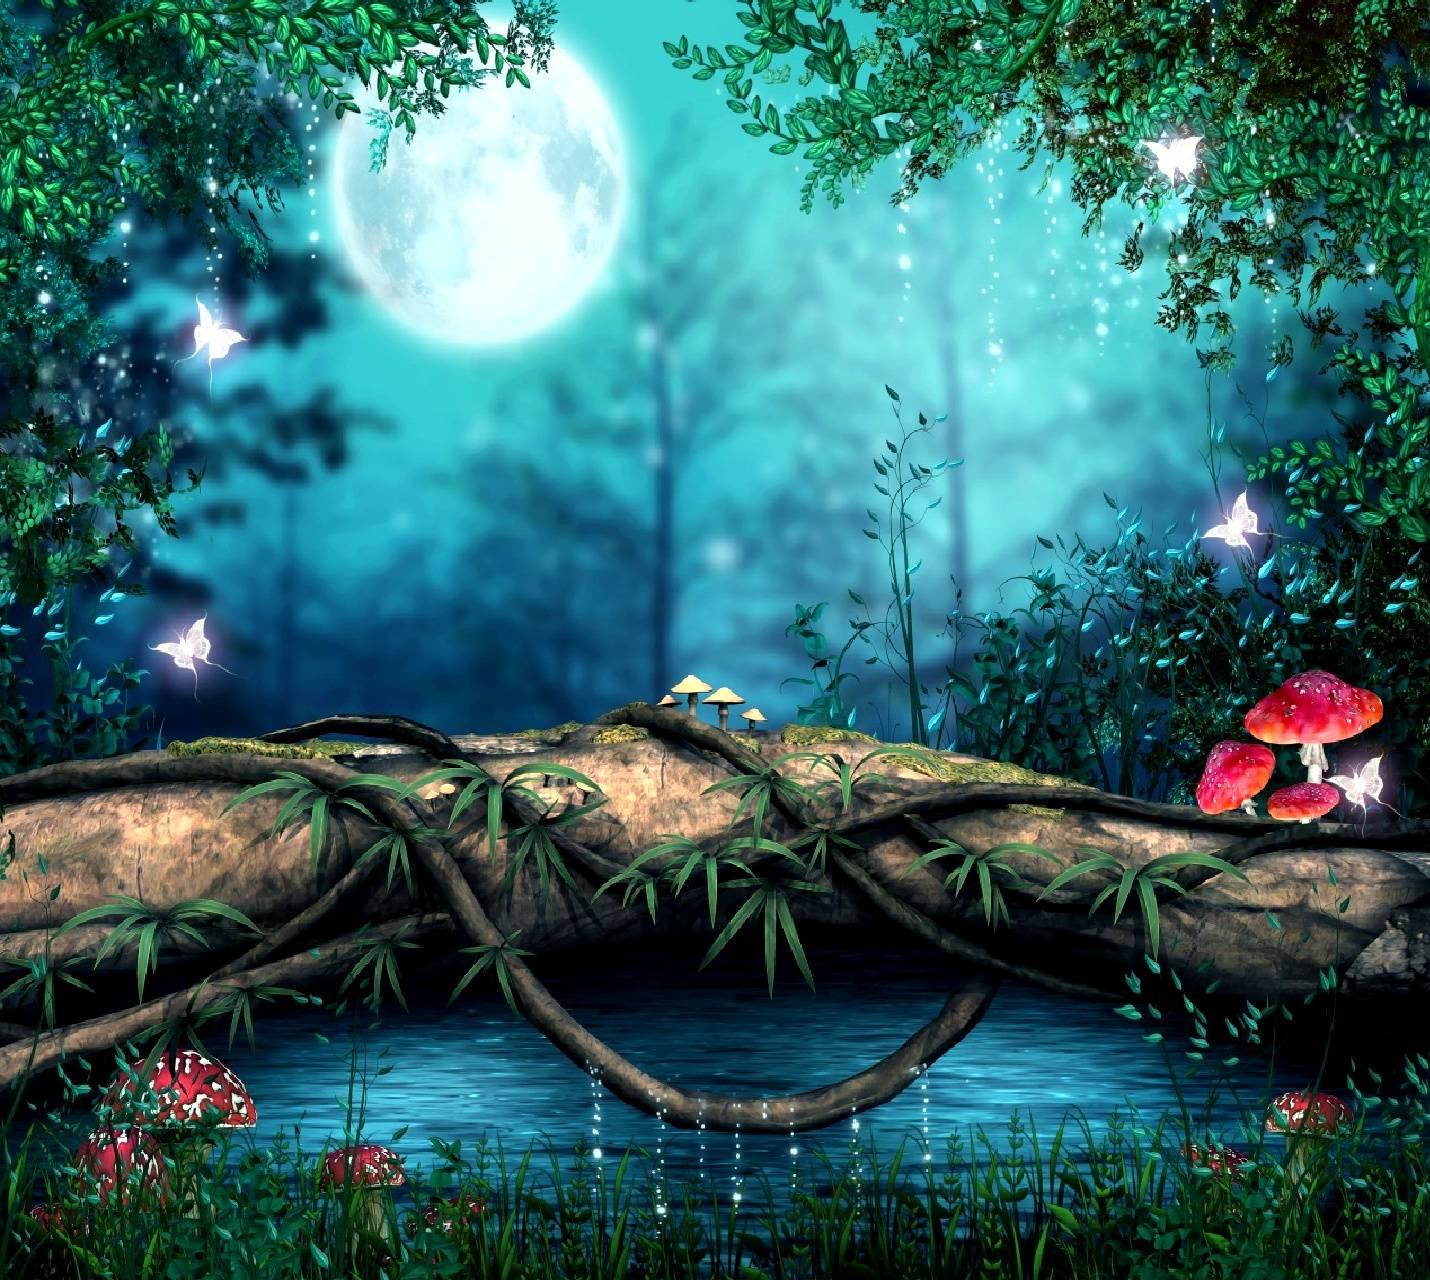 in fairy tales